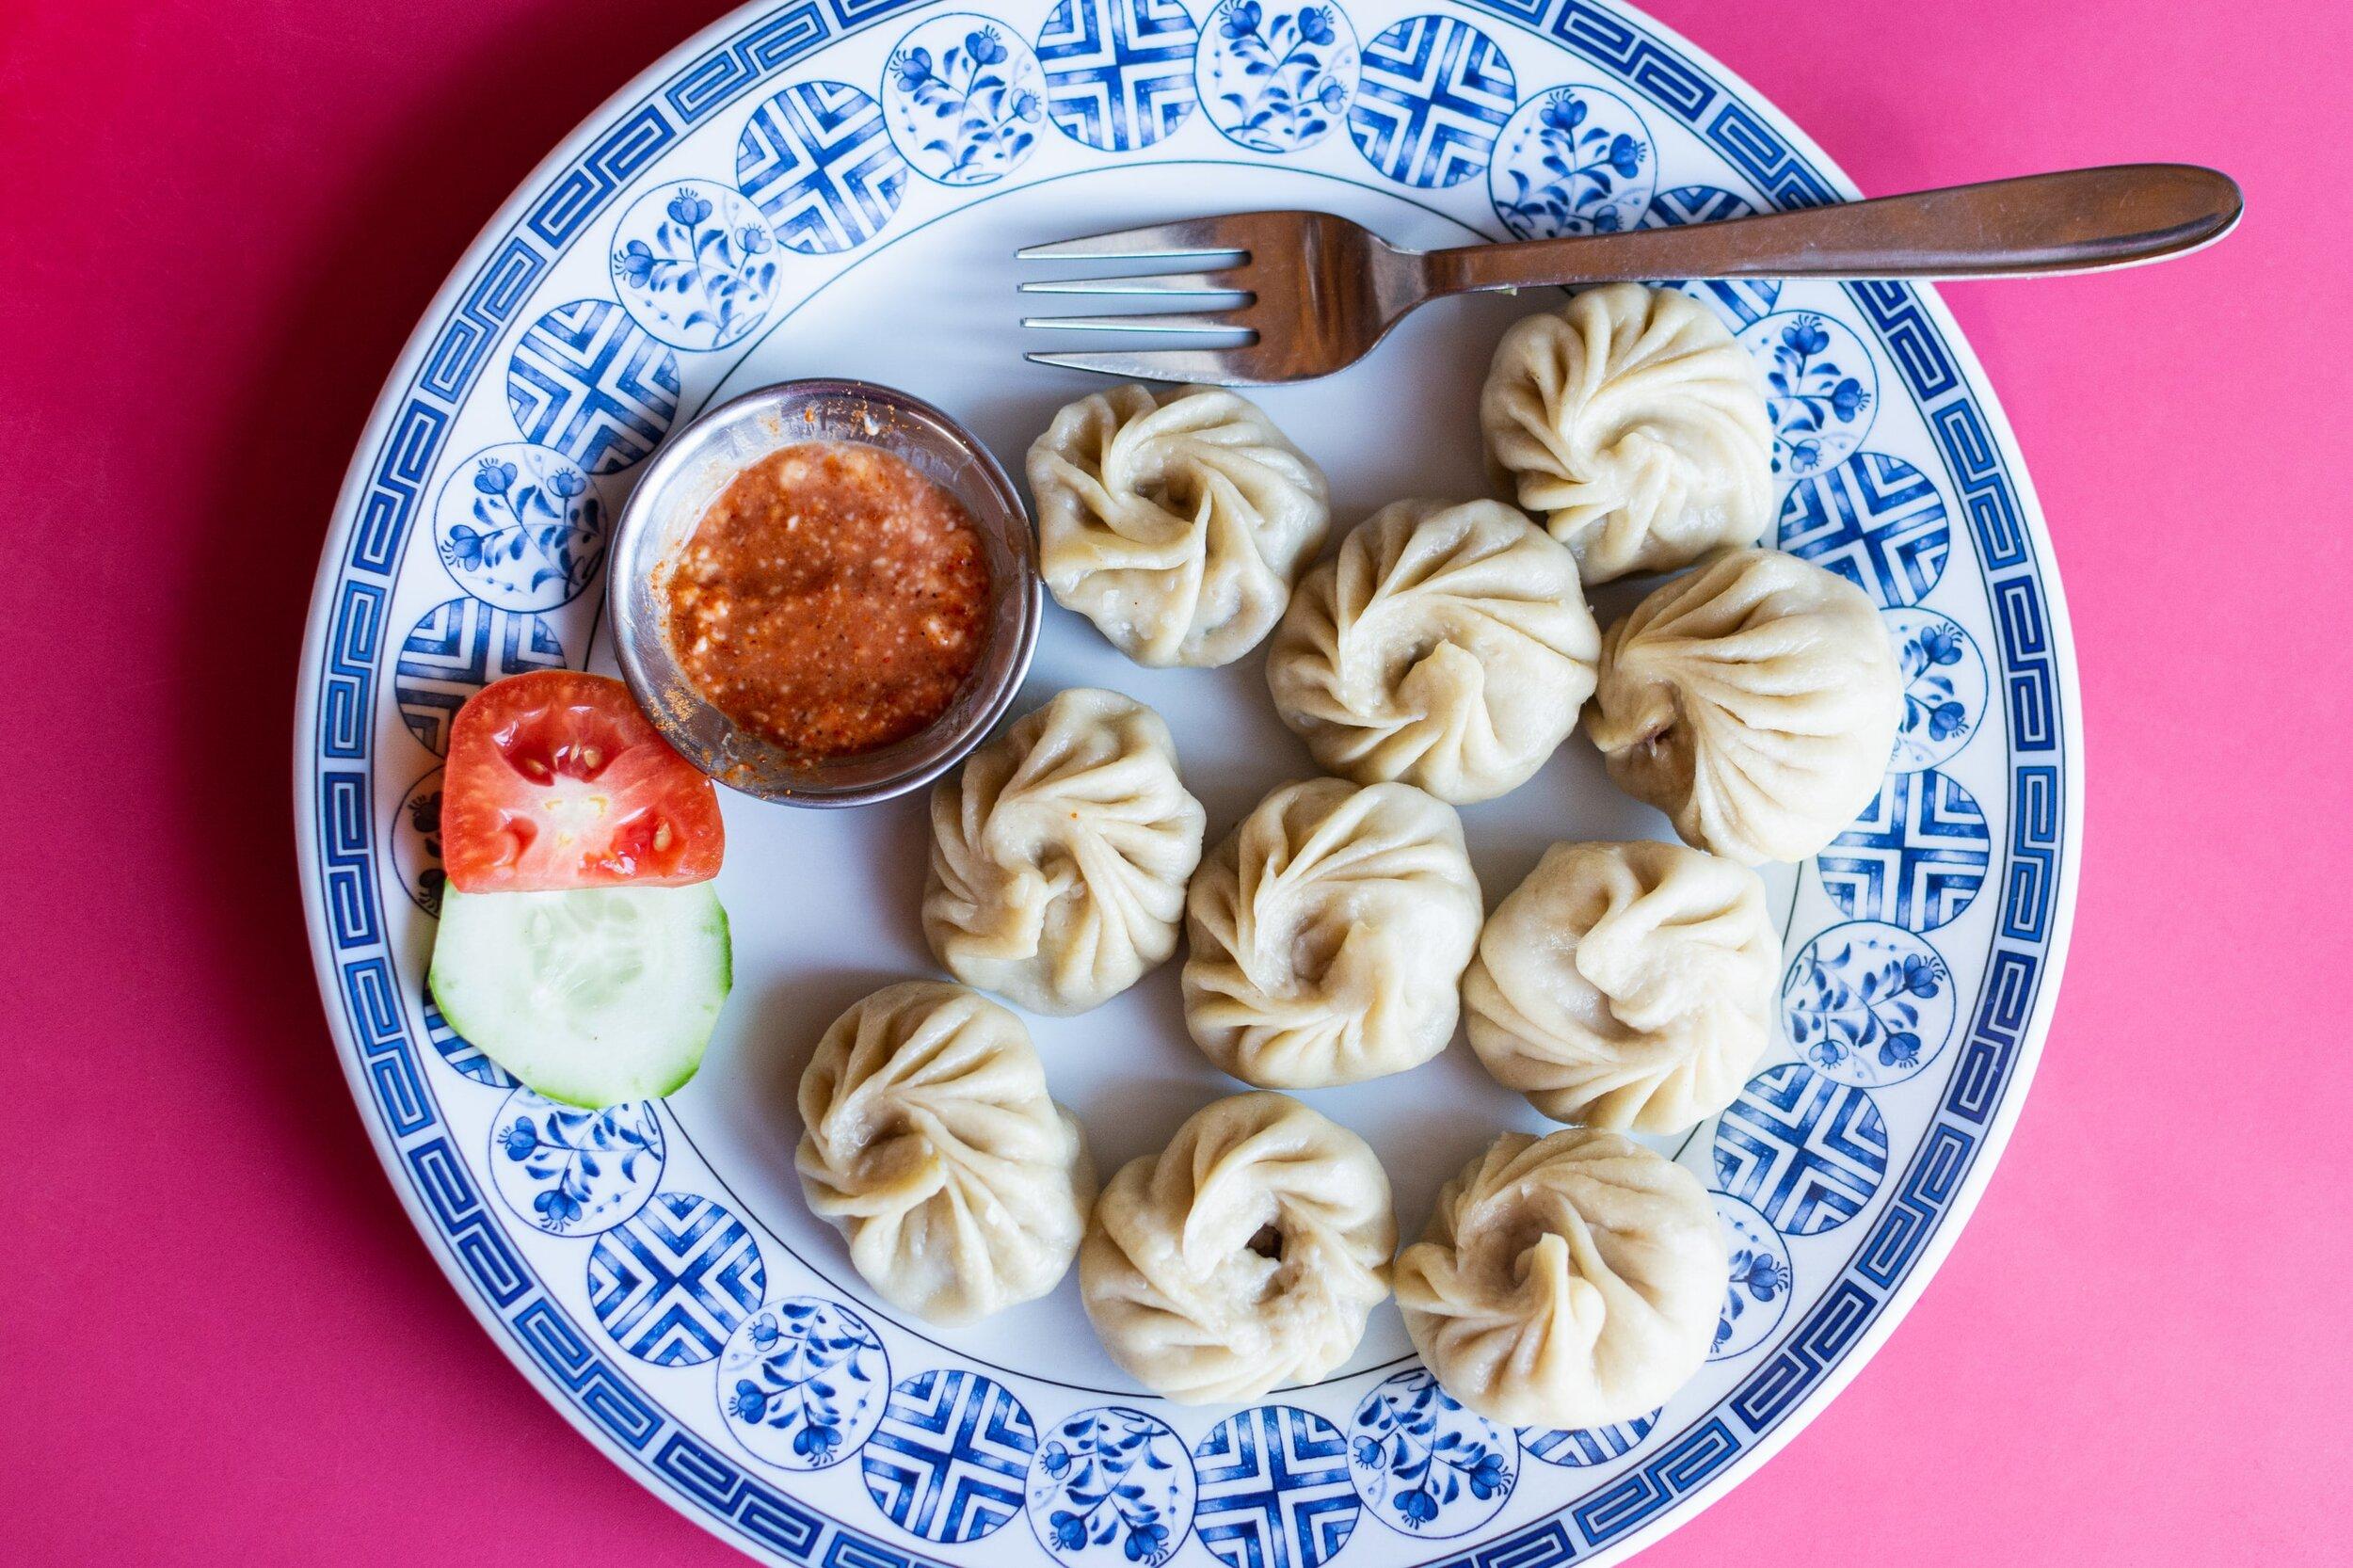 The most loved Bhutan street food, Momos